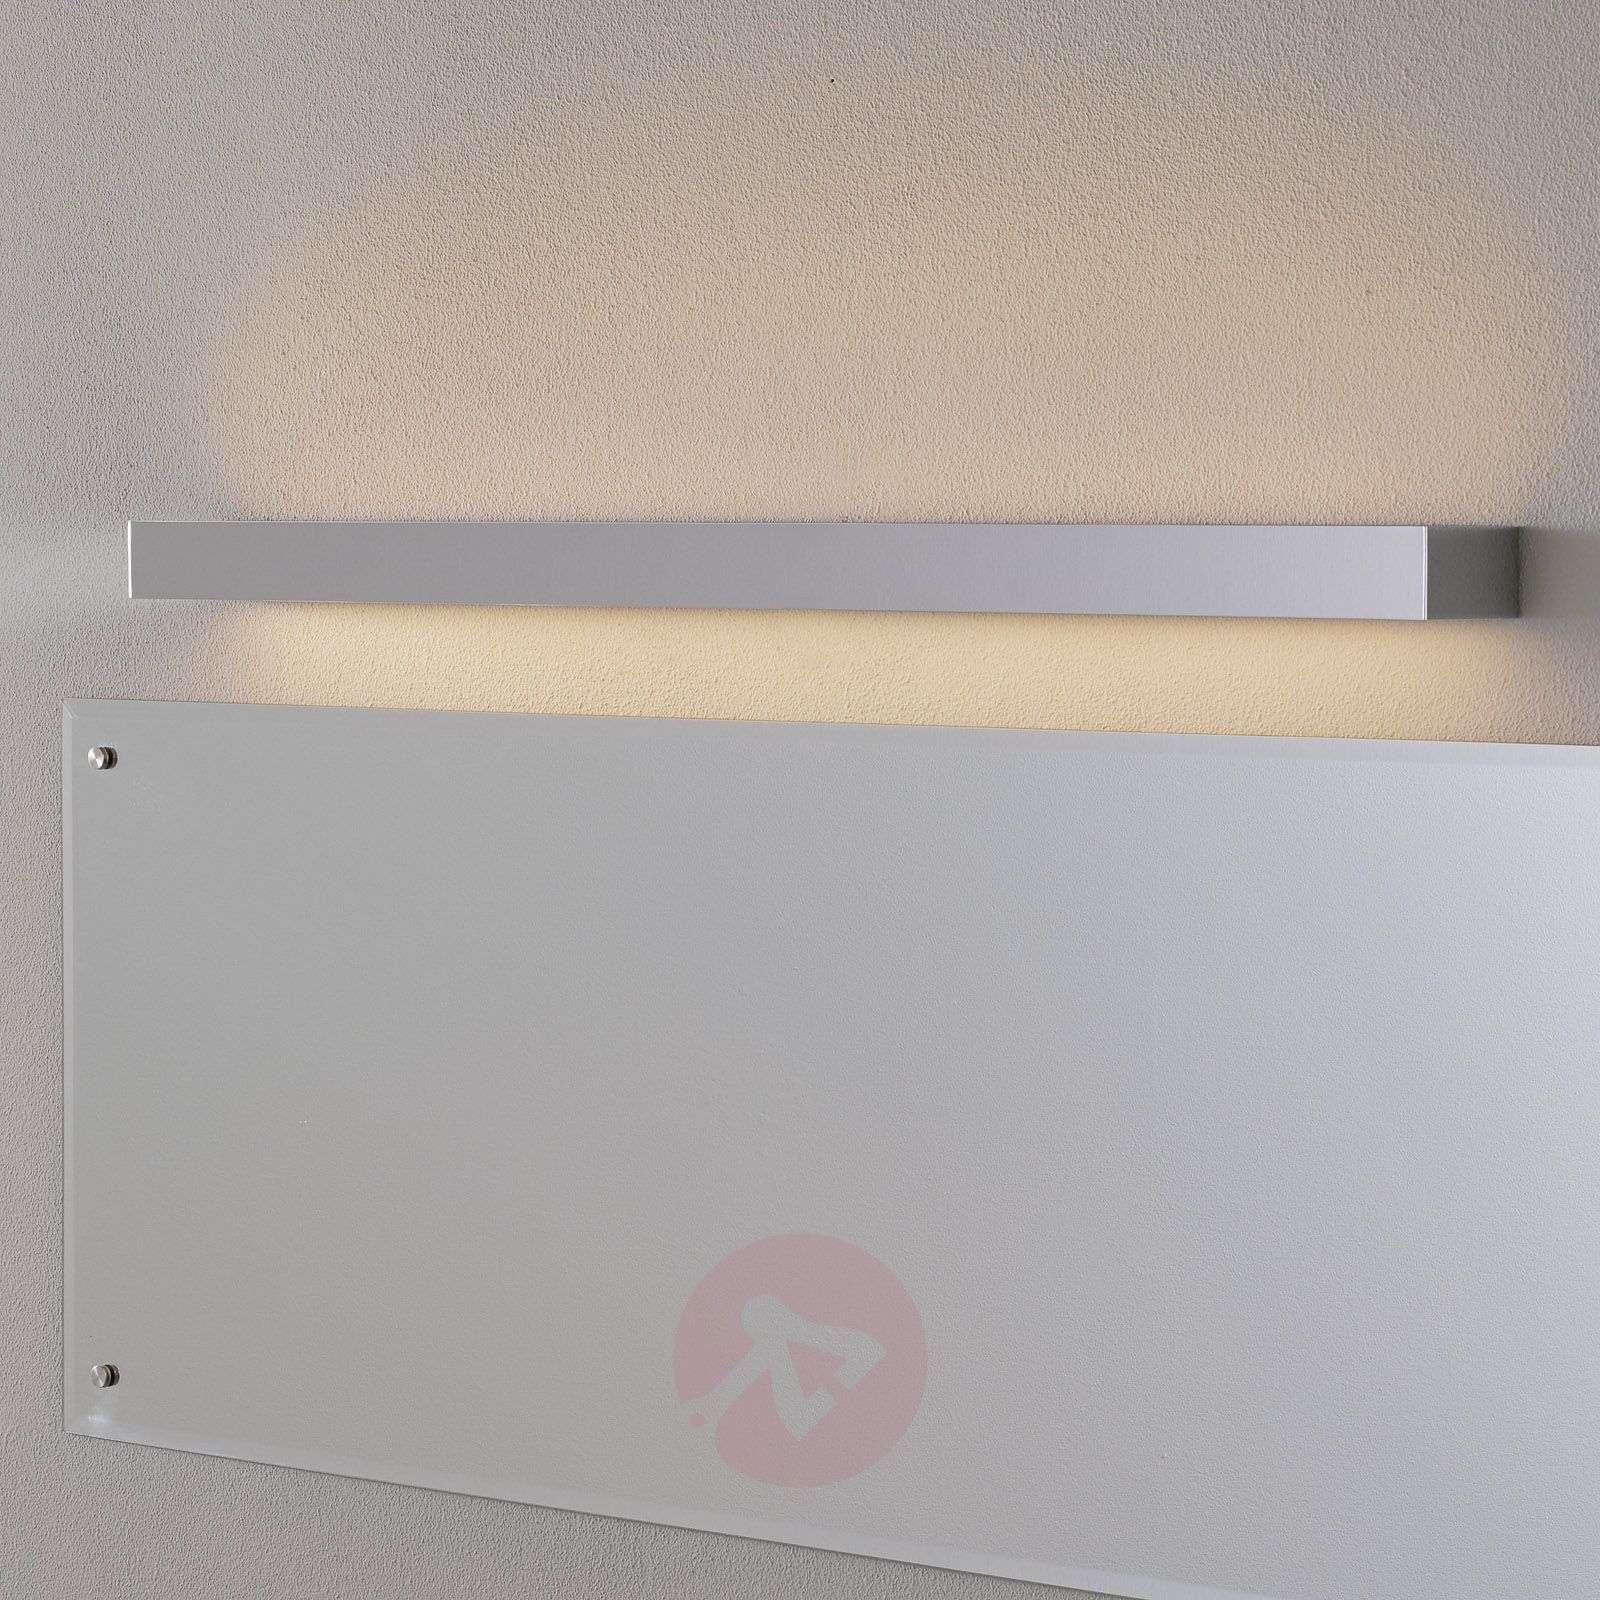 Helestra Theia LED mirror light, 90 cm-4516447-02